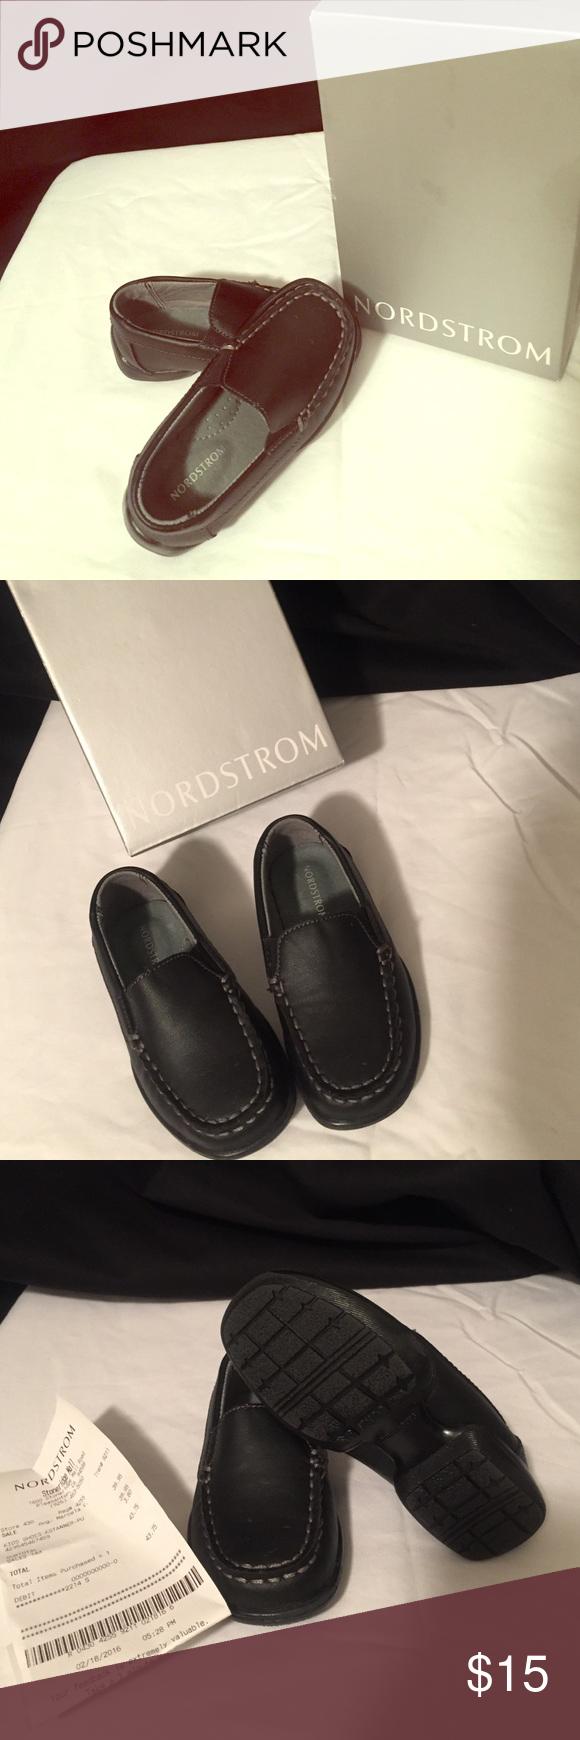 Boys dress shoes, Toddler boy dress